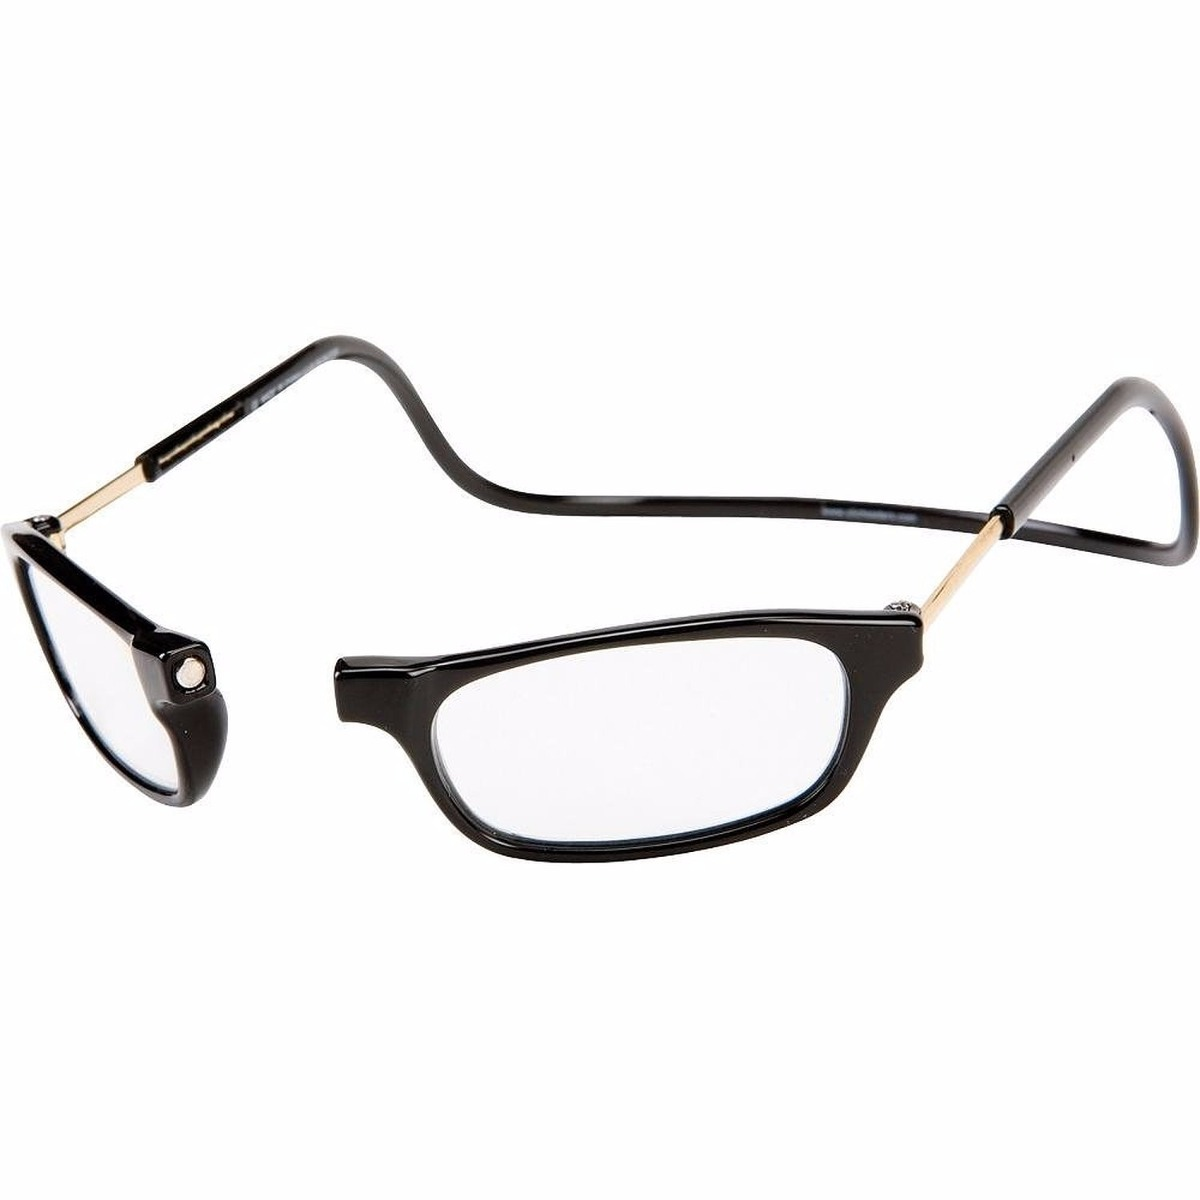 Cheater Glasses